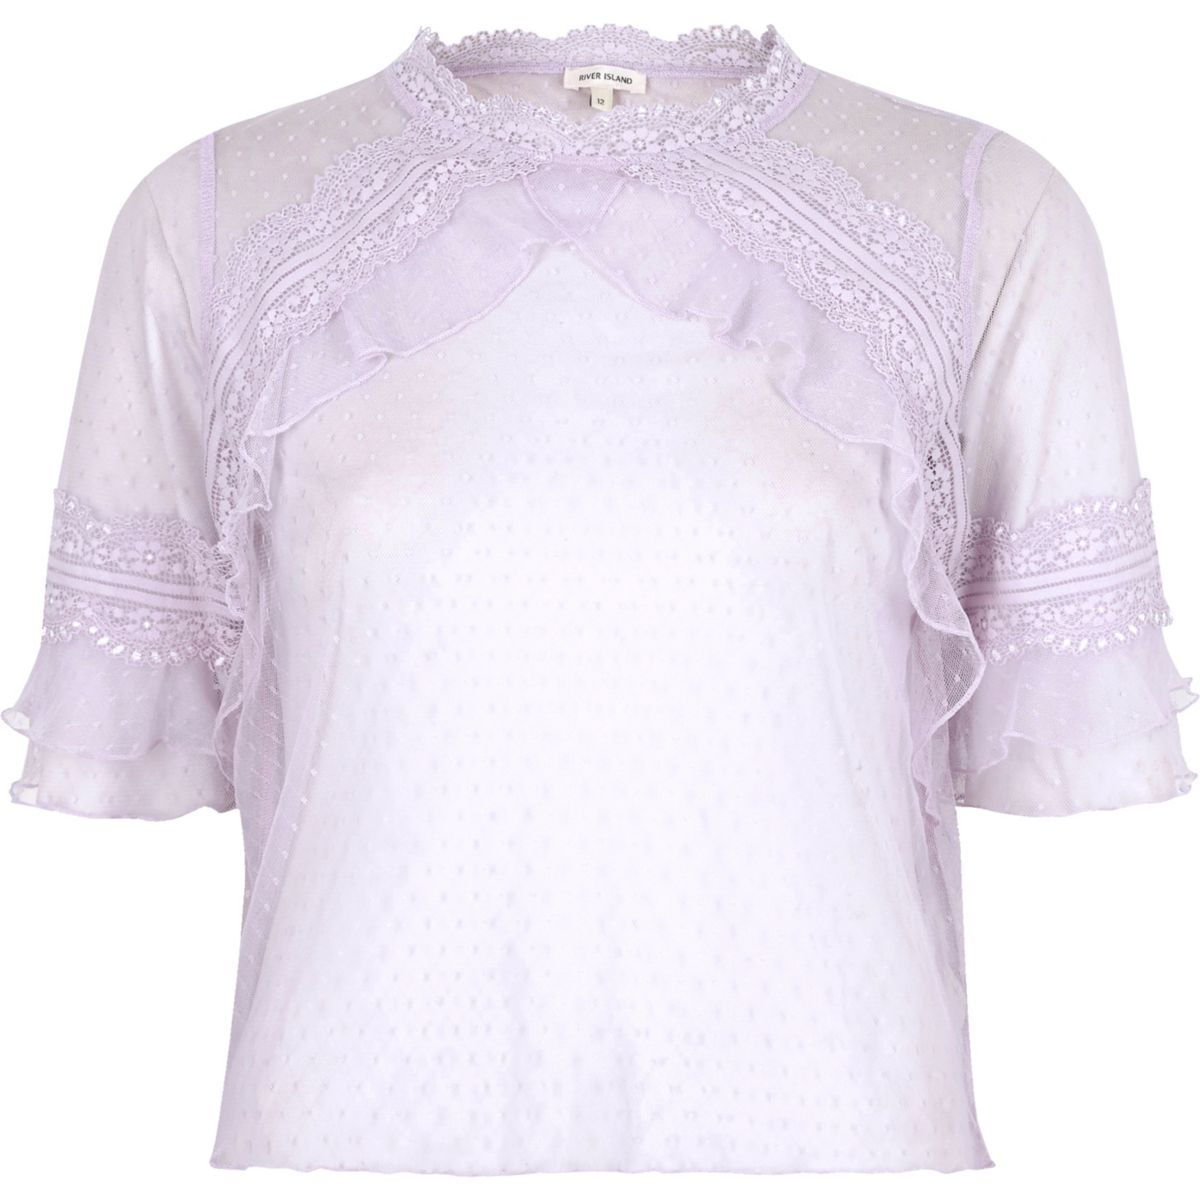 Light purple dobby mesh frill top